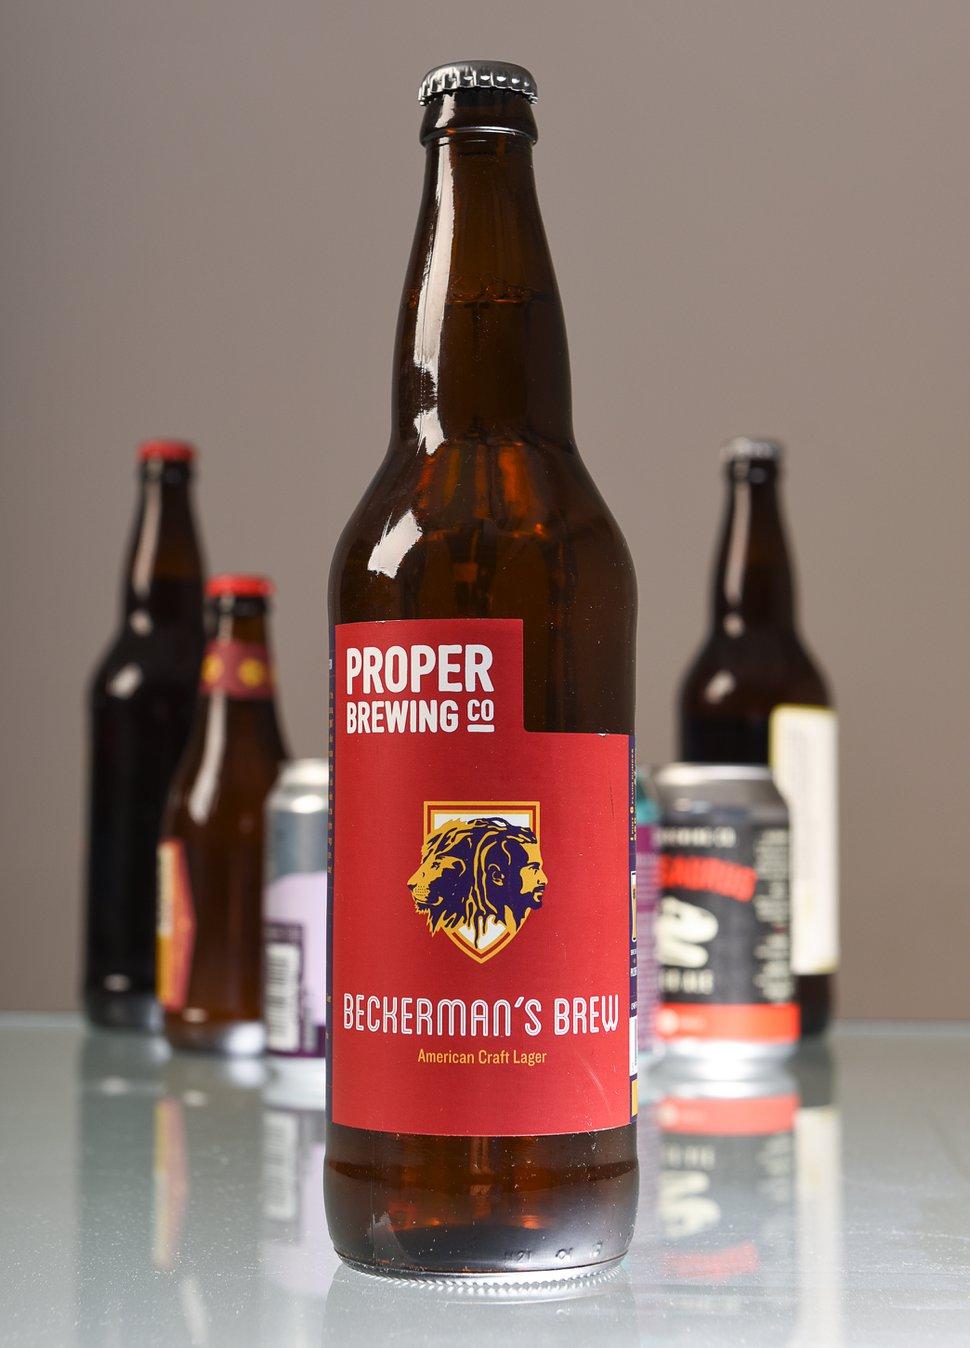 (Francisco Kjolseth | The Salt Lake Tribune) Utah's best beer names. Beckerman's Brew by Proper Brewing Co.